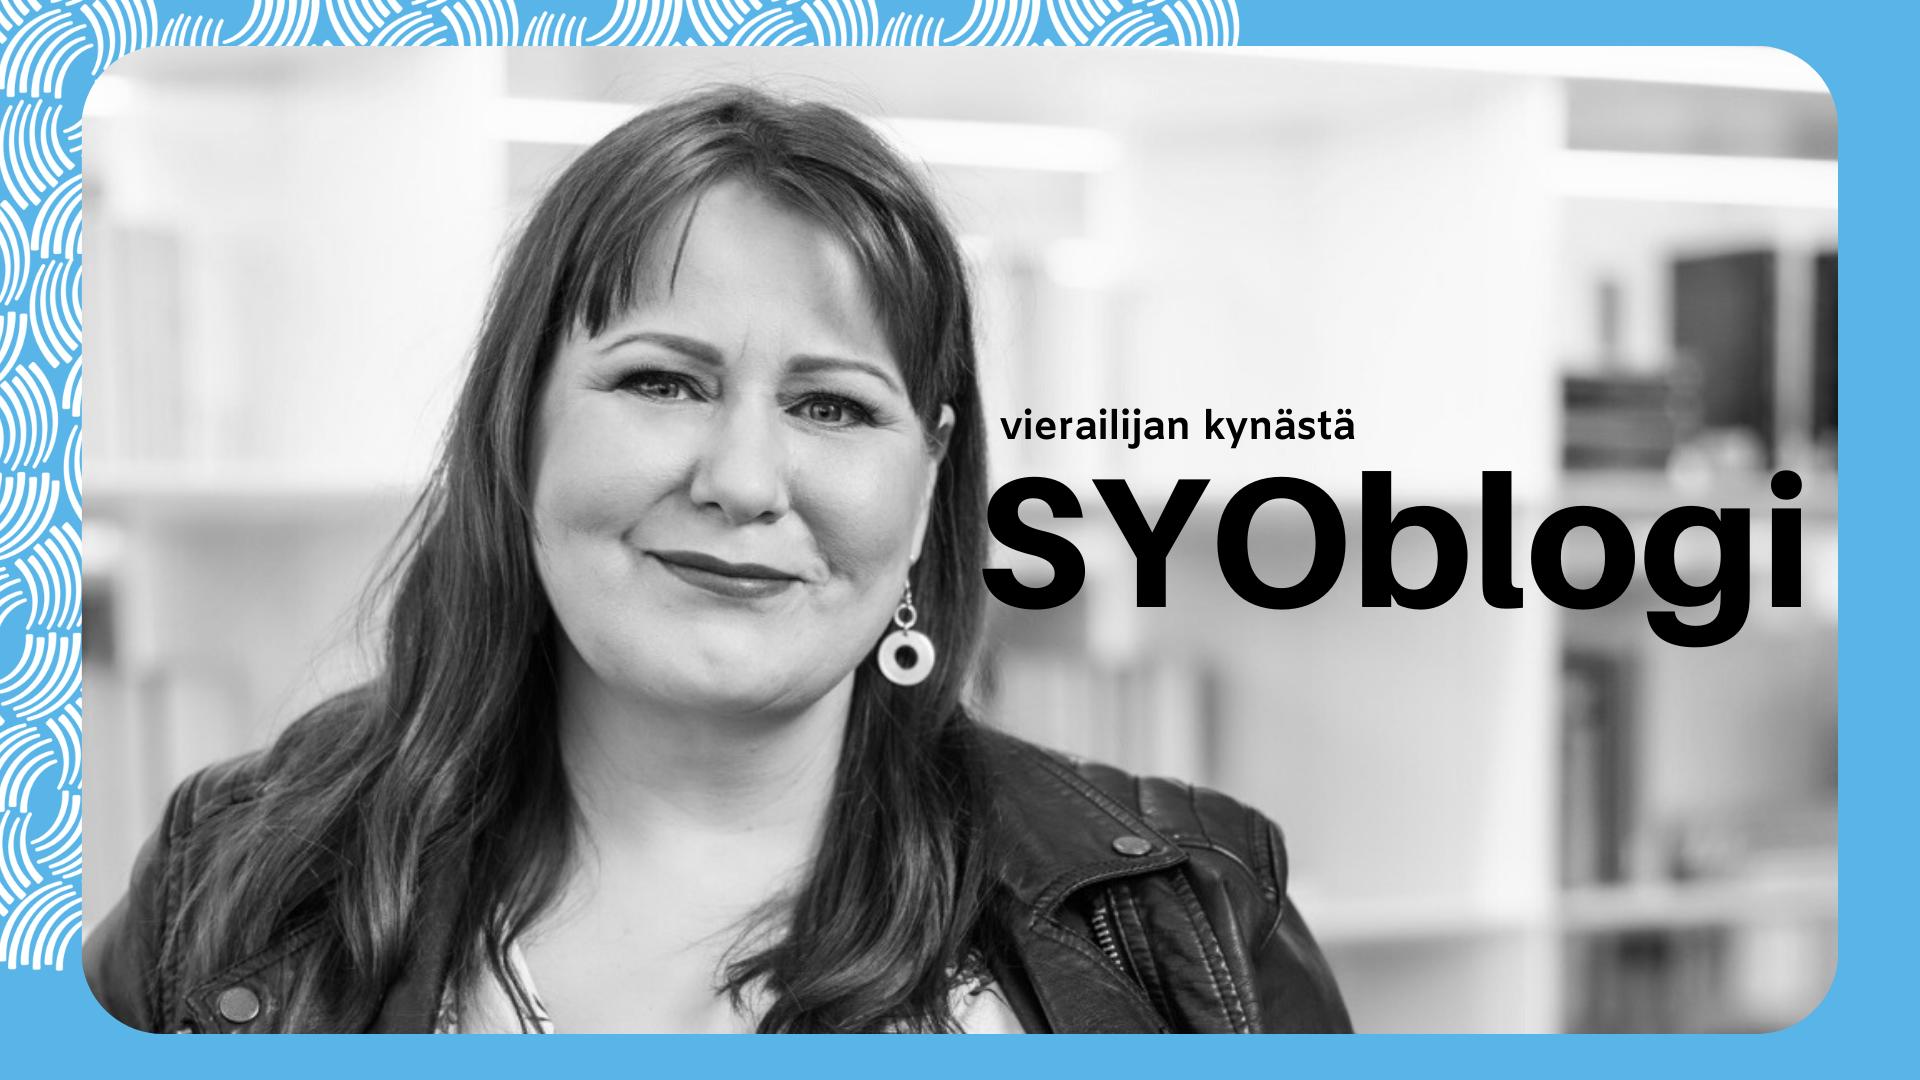 SYOblogi, futuristi Elina Hiltunen.